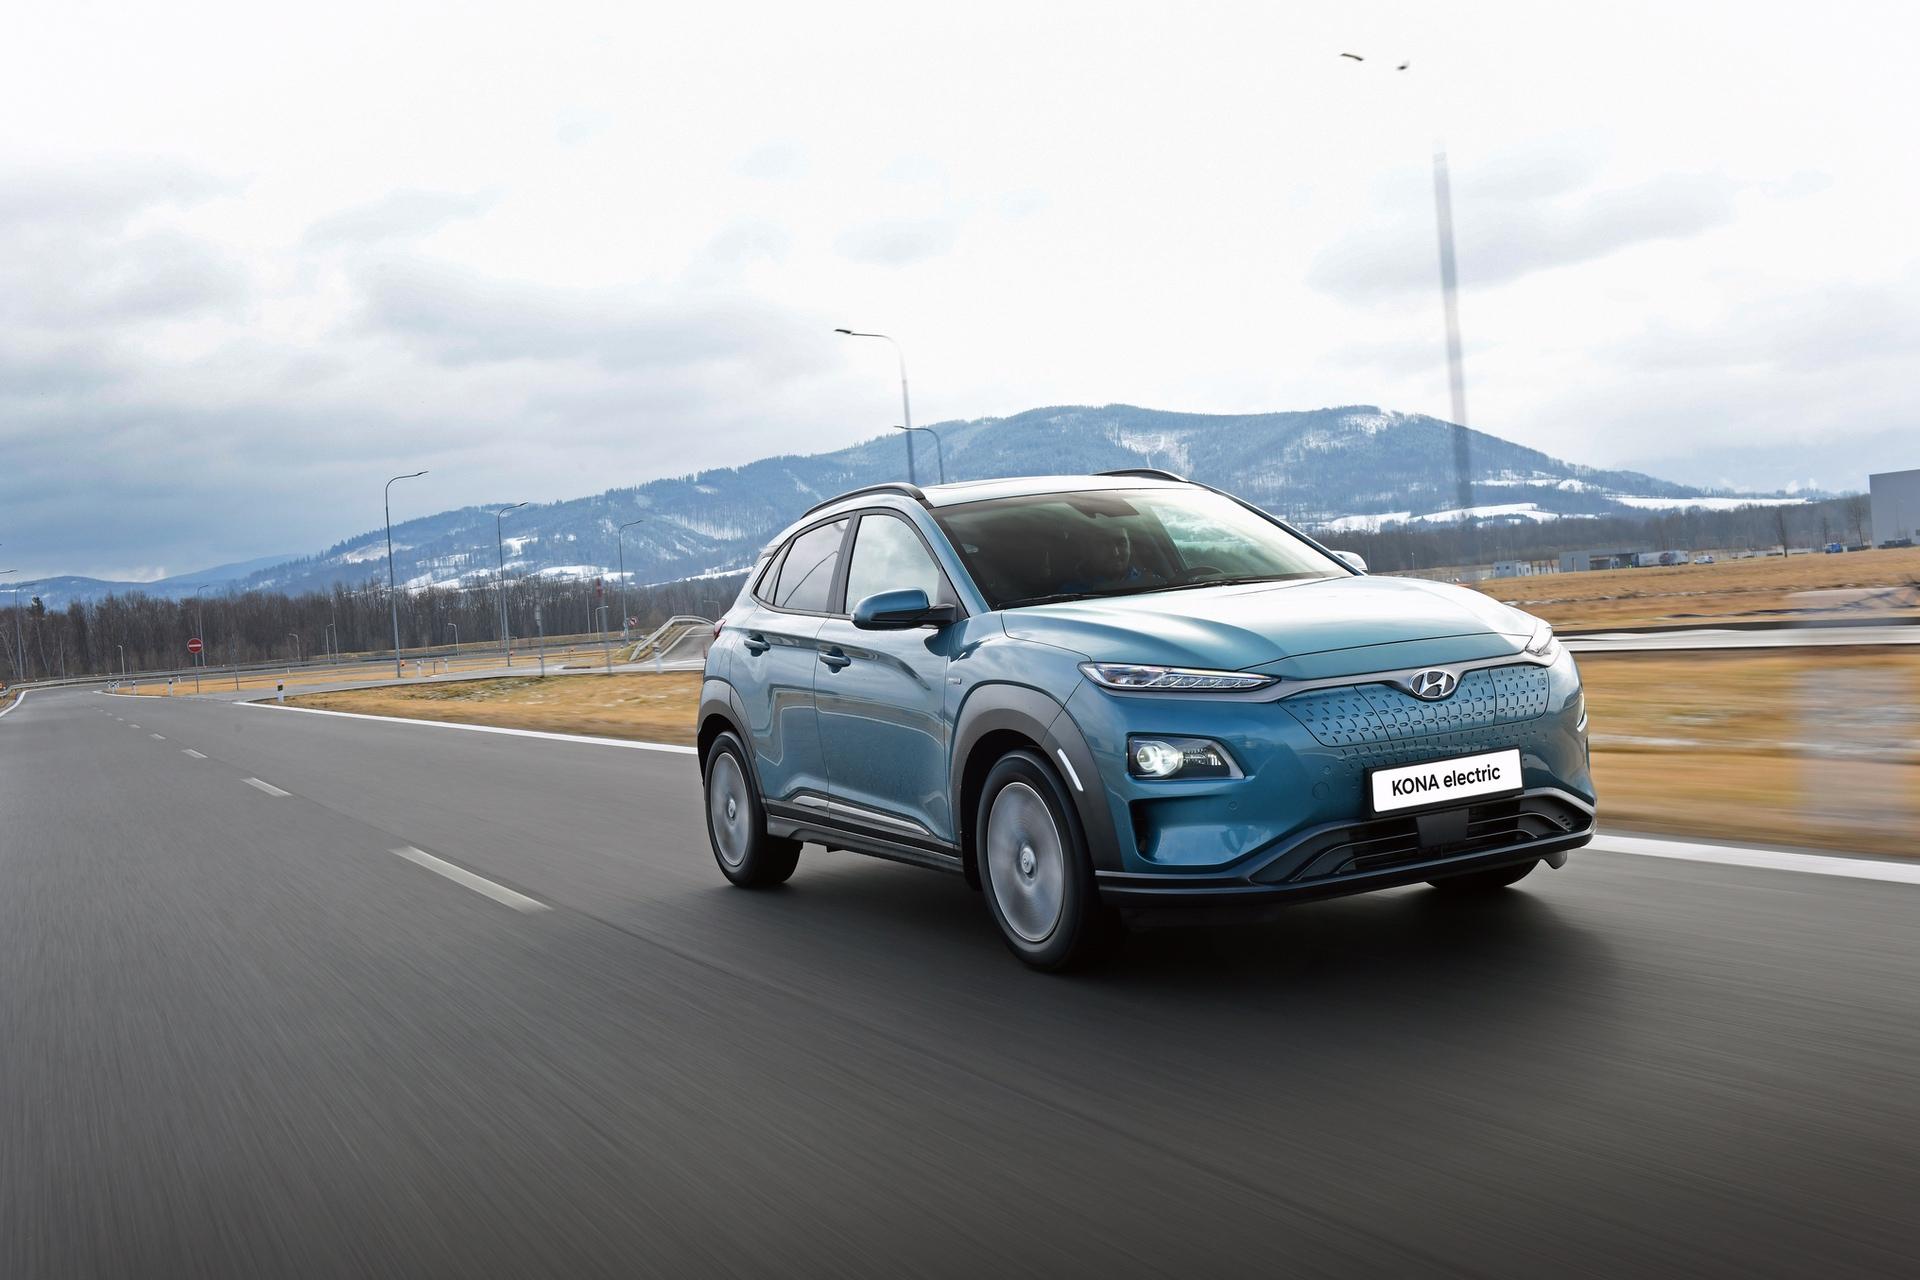 Hyundai_Kona_electric_Werk_Nosovice_118b